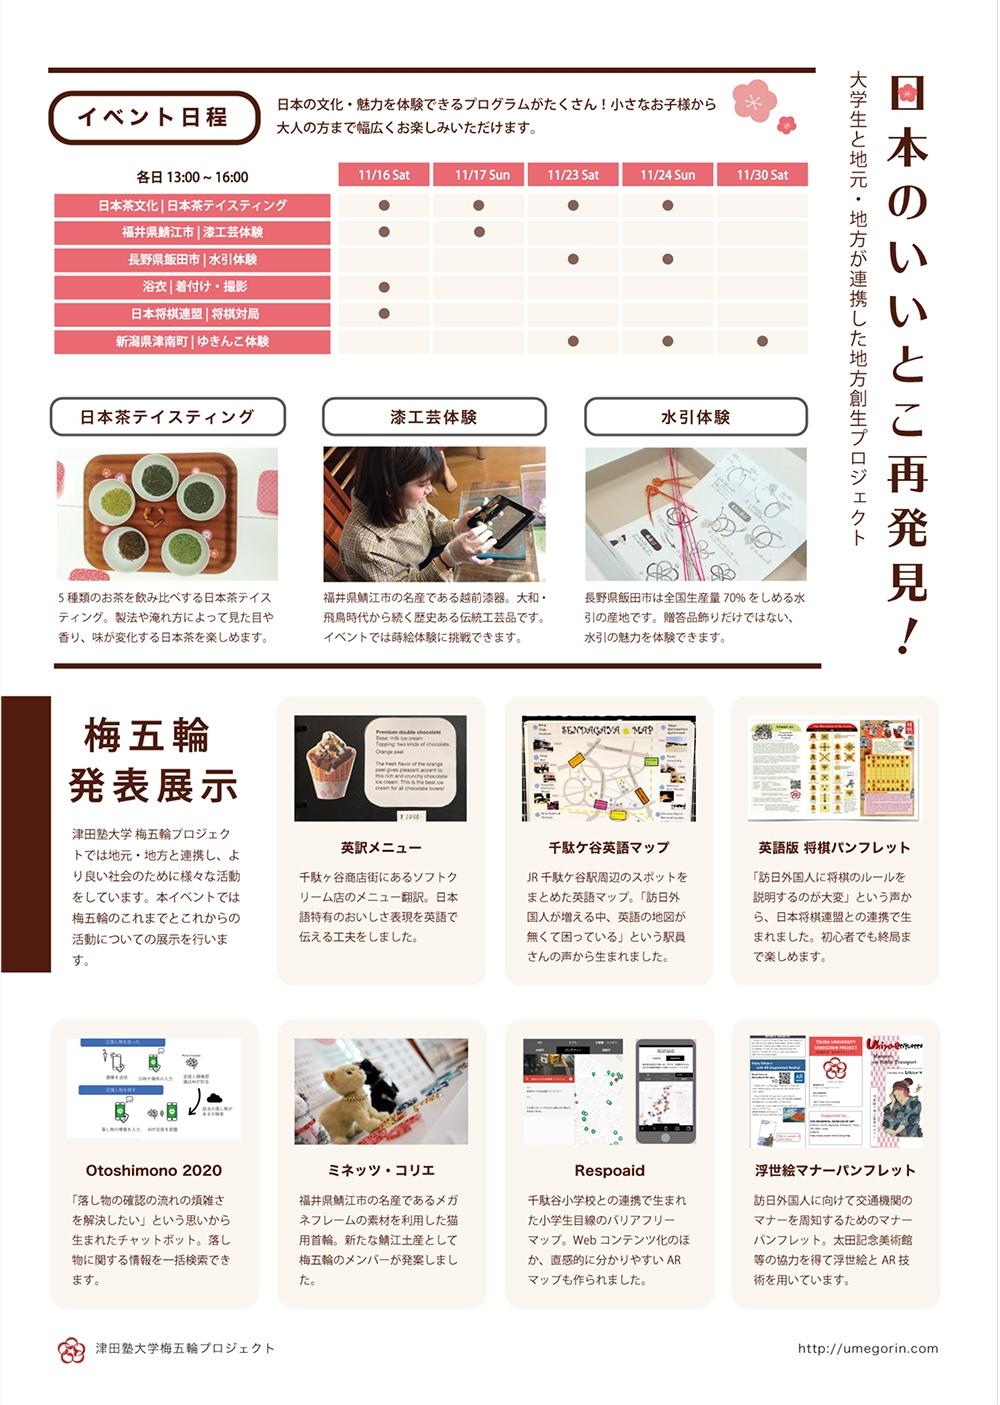 https://www.shogi.or.jp/event/Flyer_umegorin-2.jpg